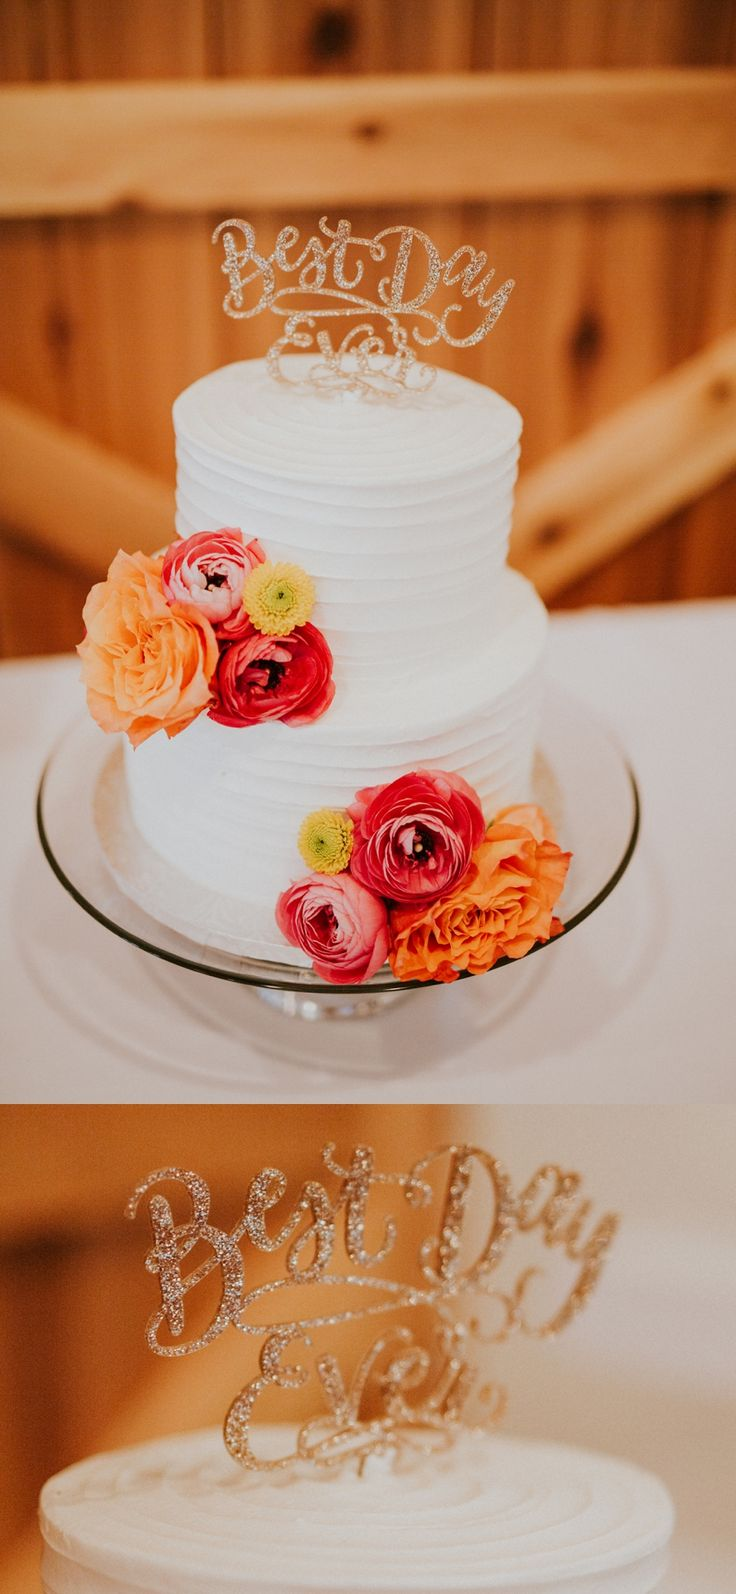 wedding cake #rusticweddinginspiration